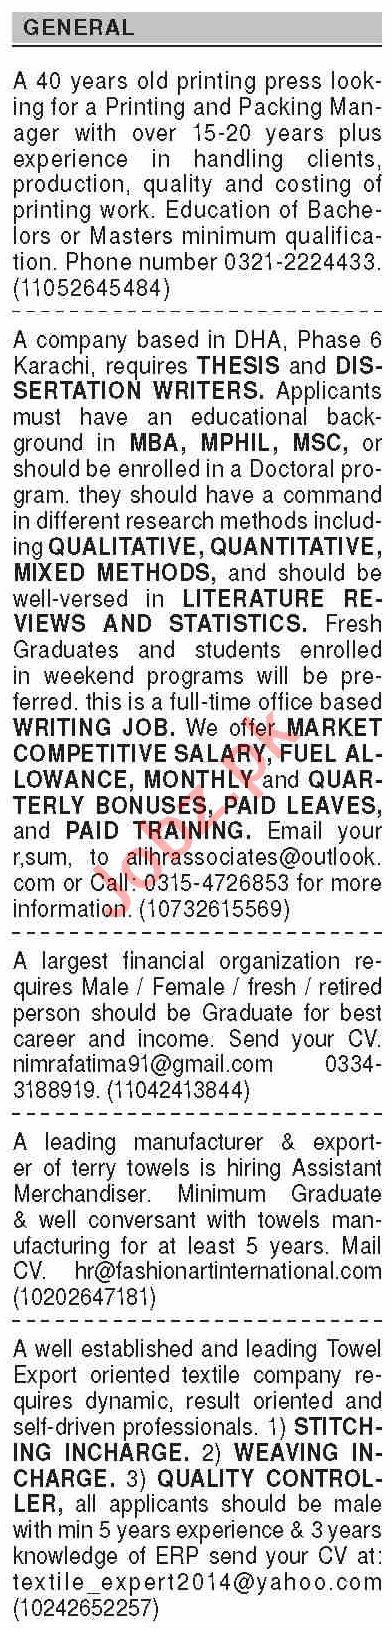 Dawn Sunday Classified Ads 14th Feb 2021 for General Staff